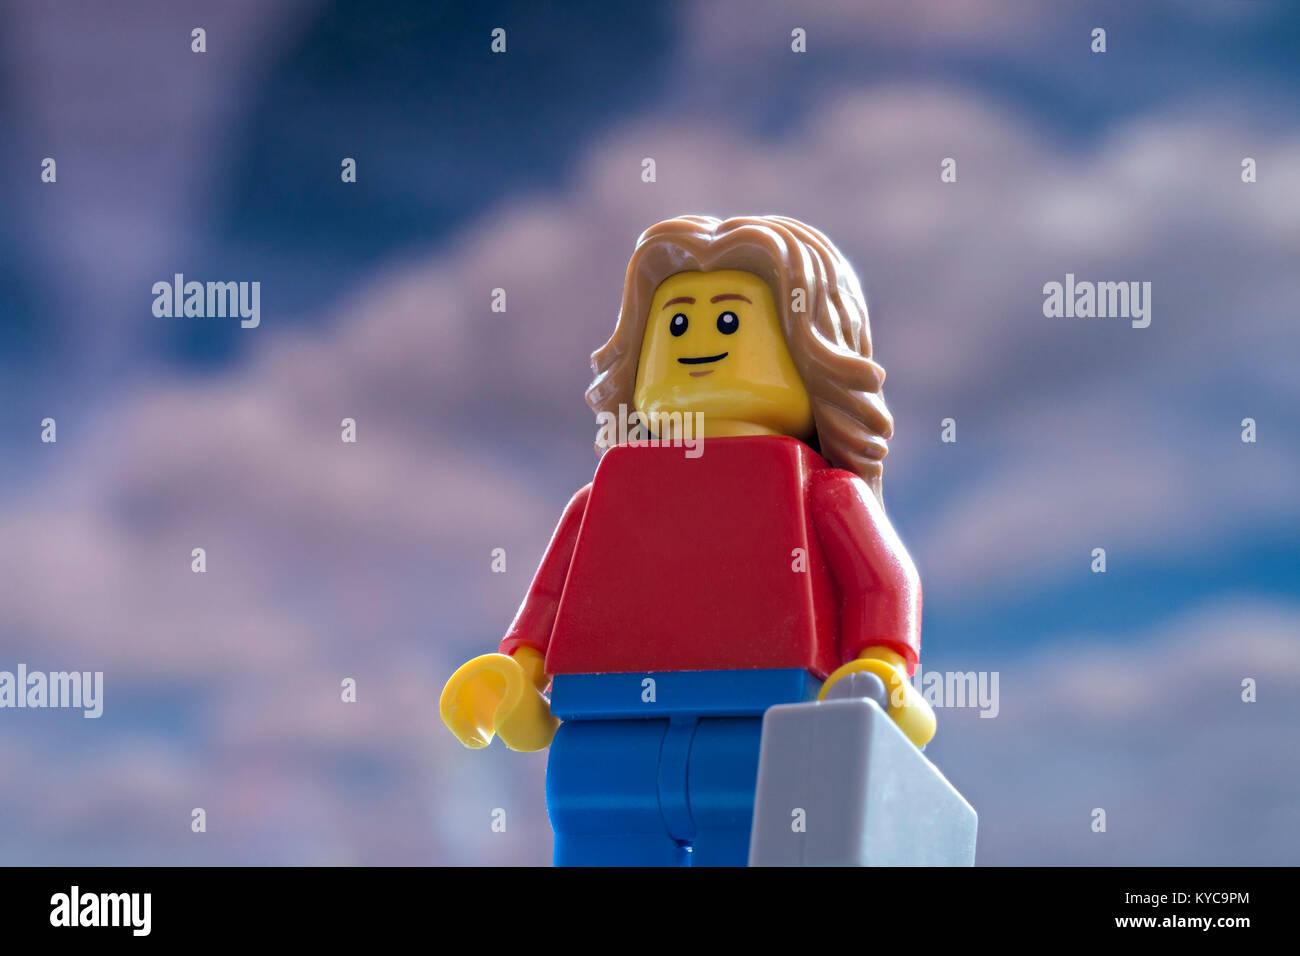 Lego tourist mini-figure - Stock Image